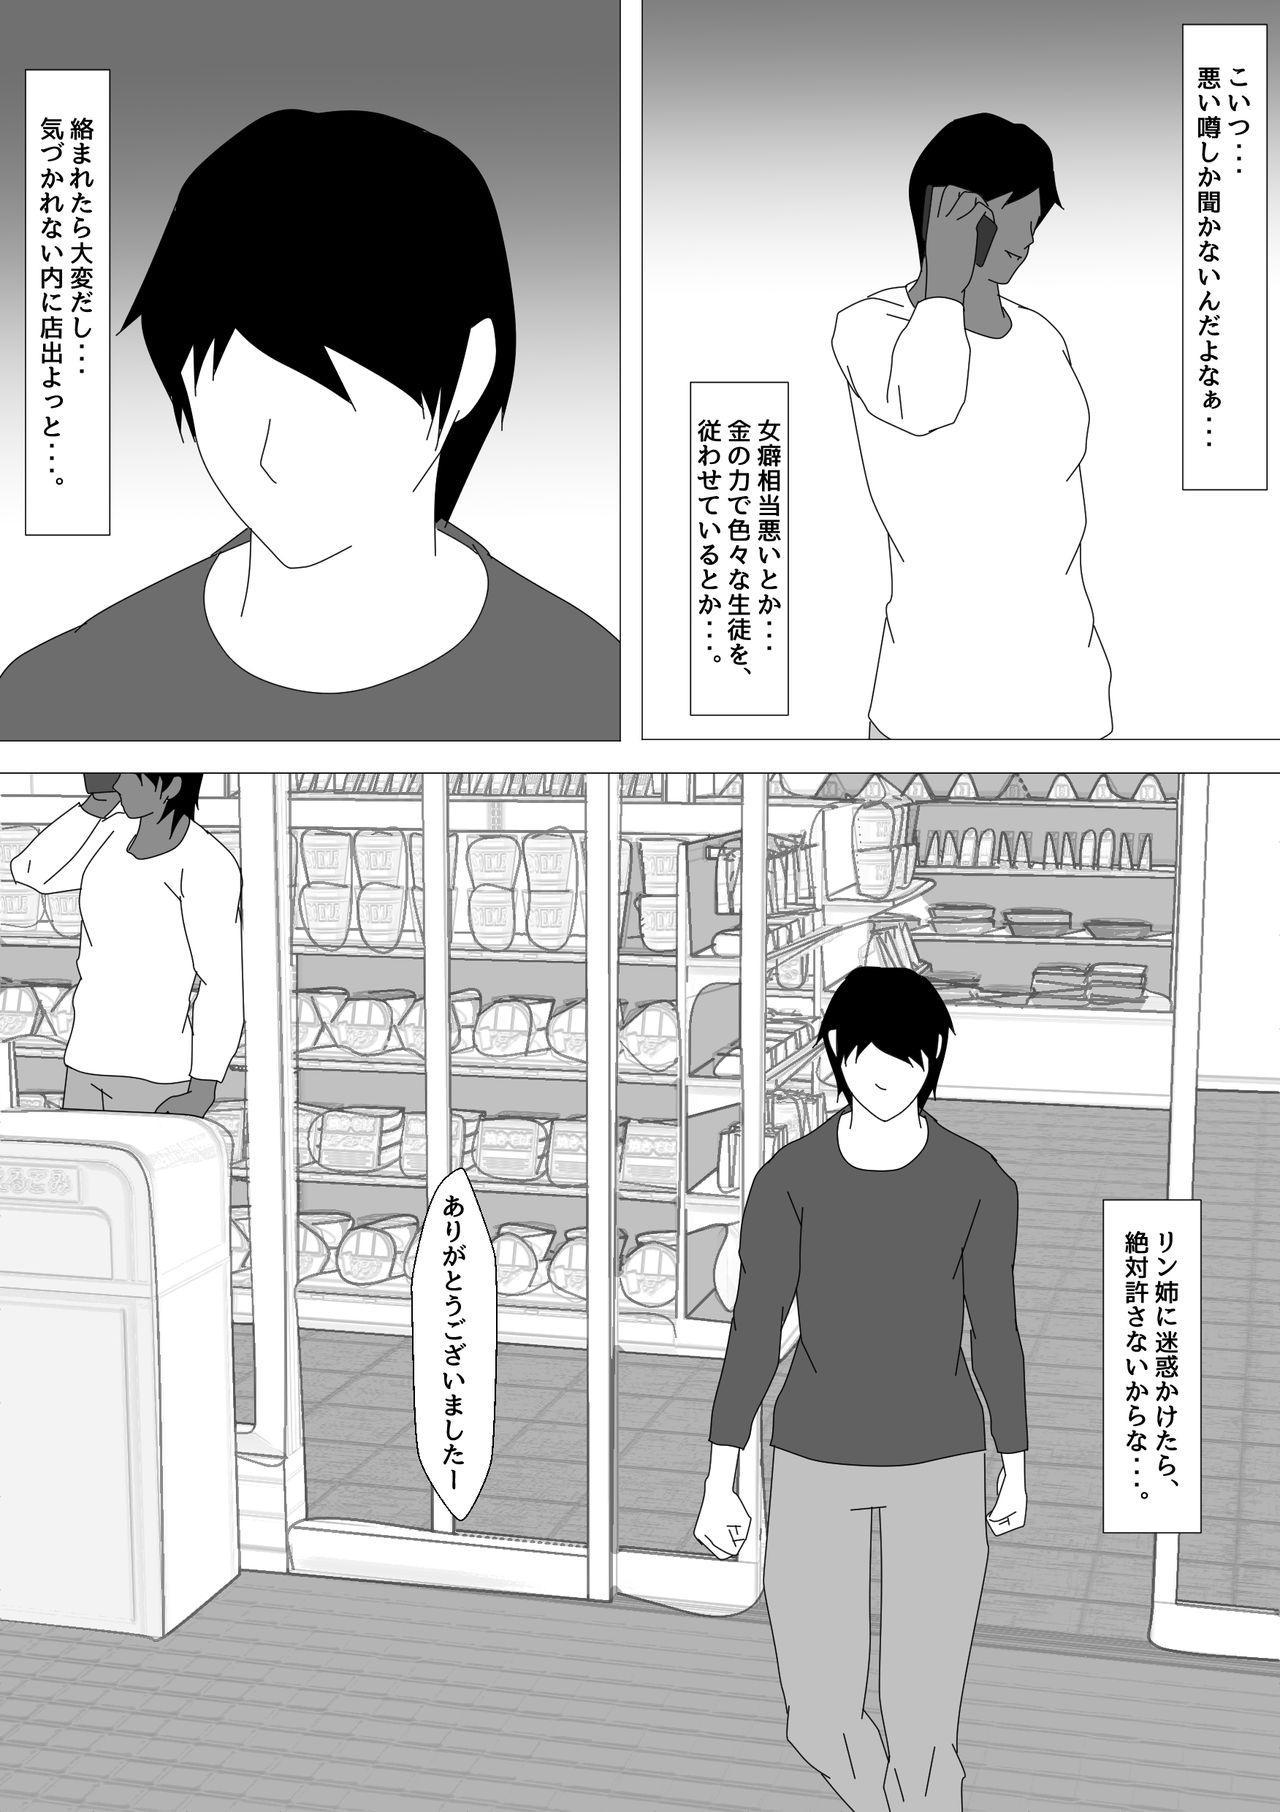 Jokyoushi Shinozaki Rin no Choukyou Kiroku Dai 2 | Female Teacher Rin Shinozaki's Training Record 2 33